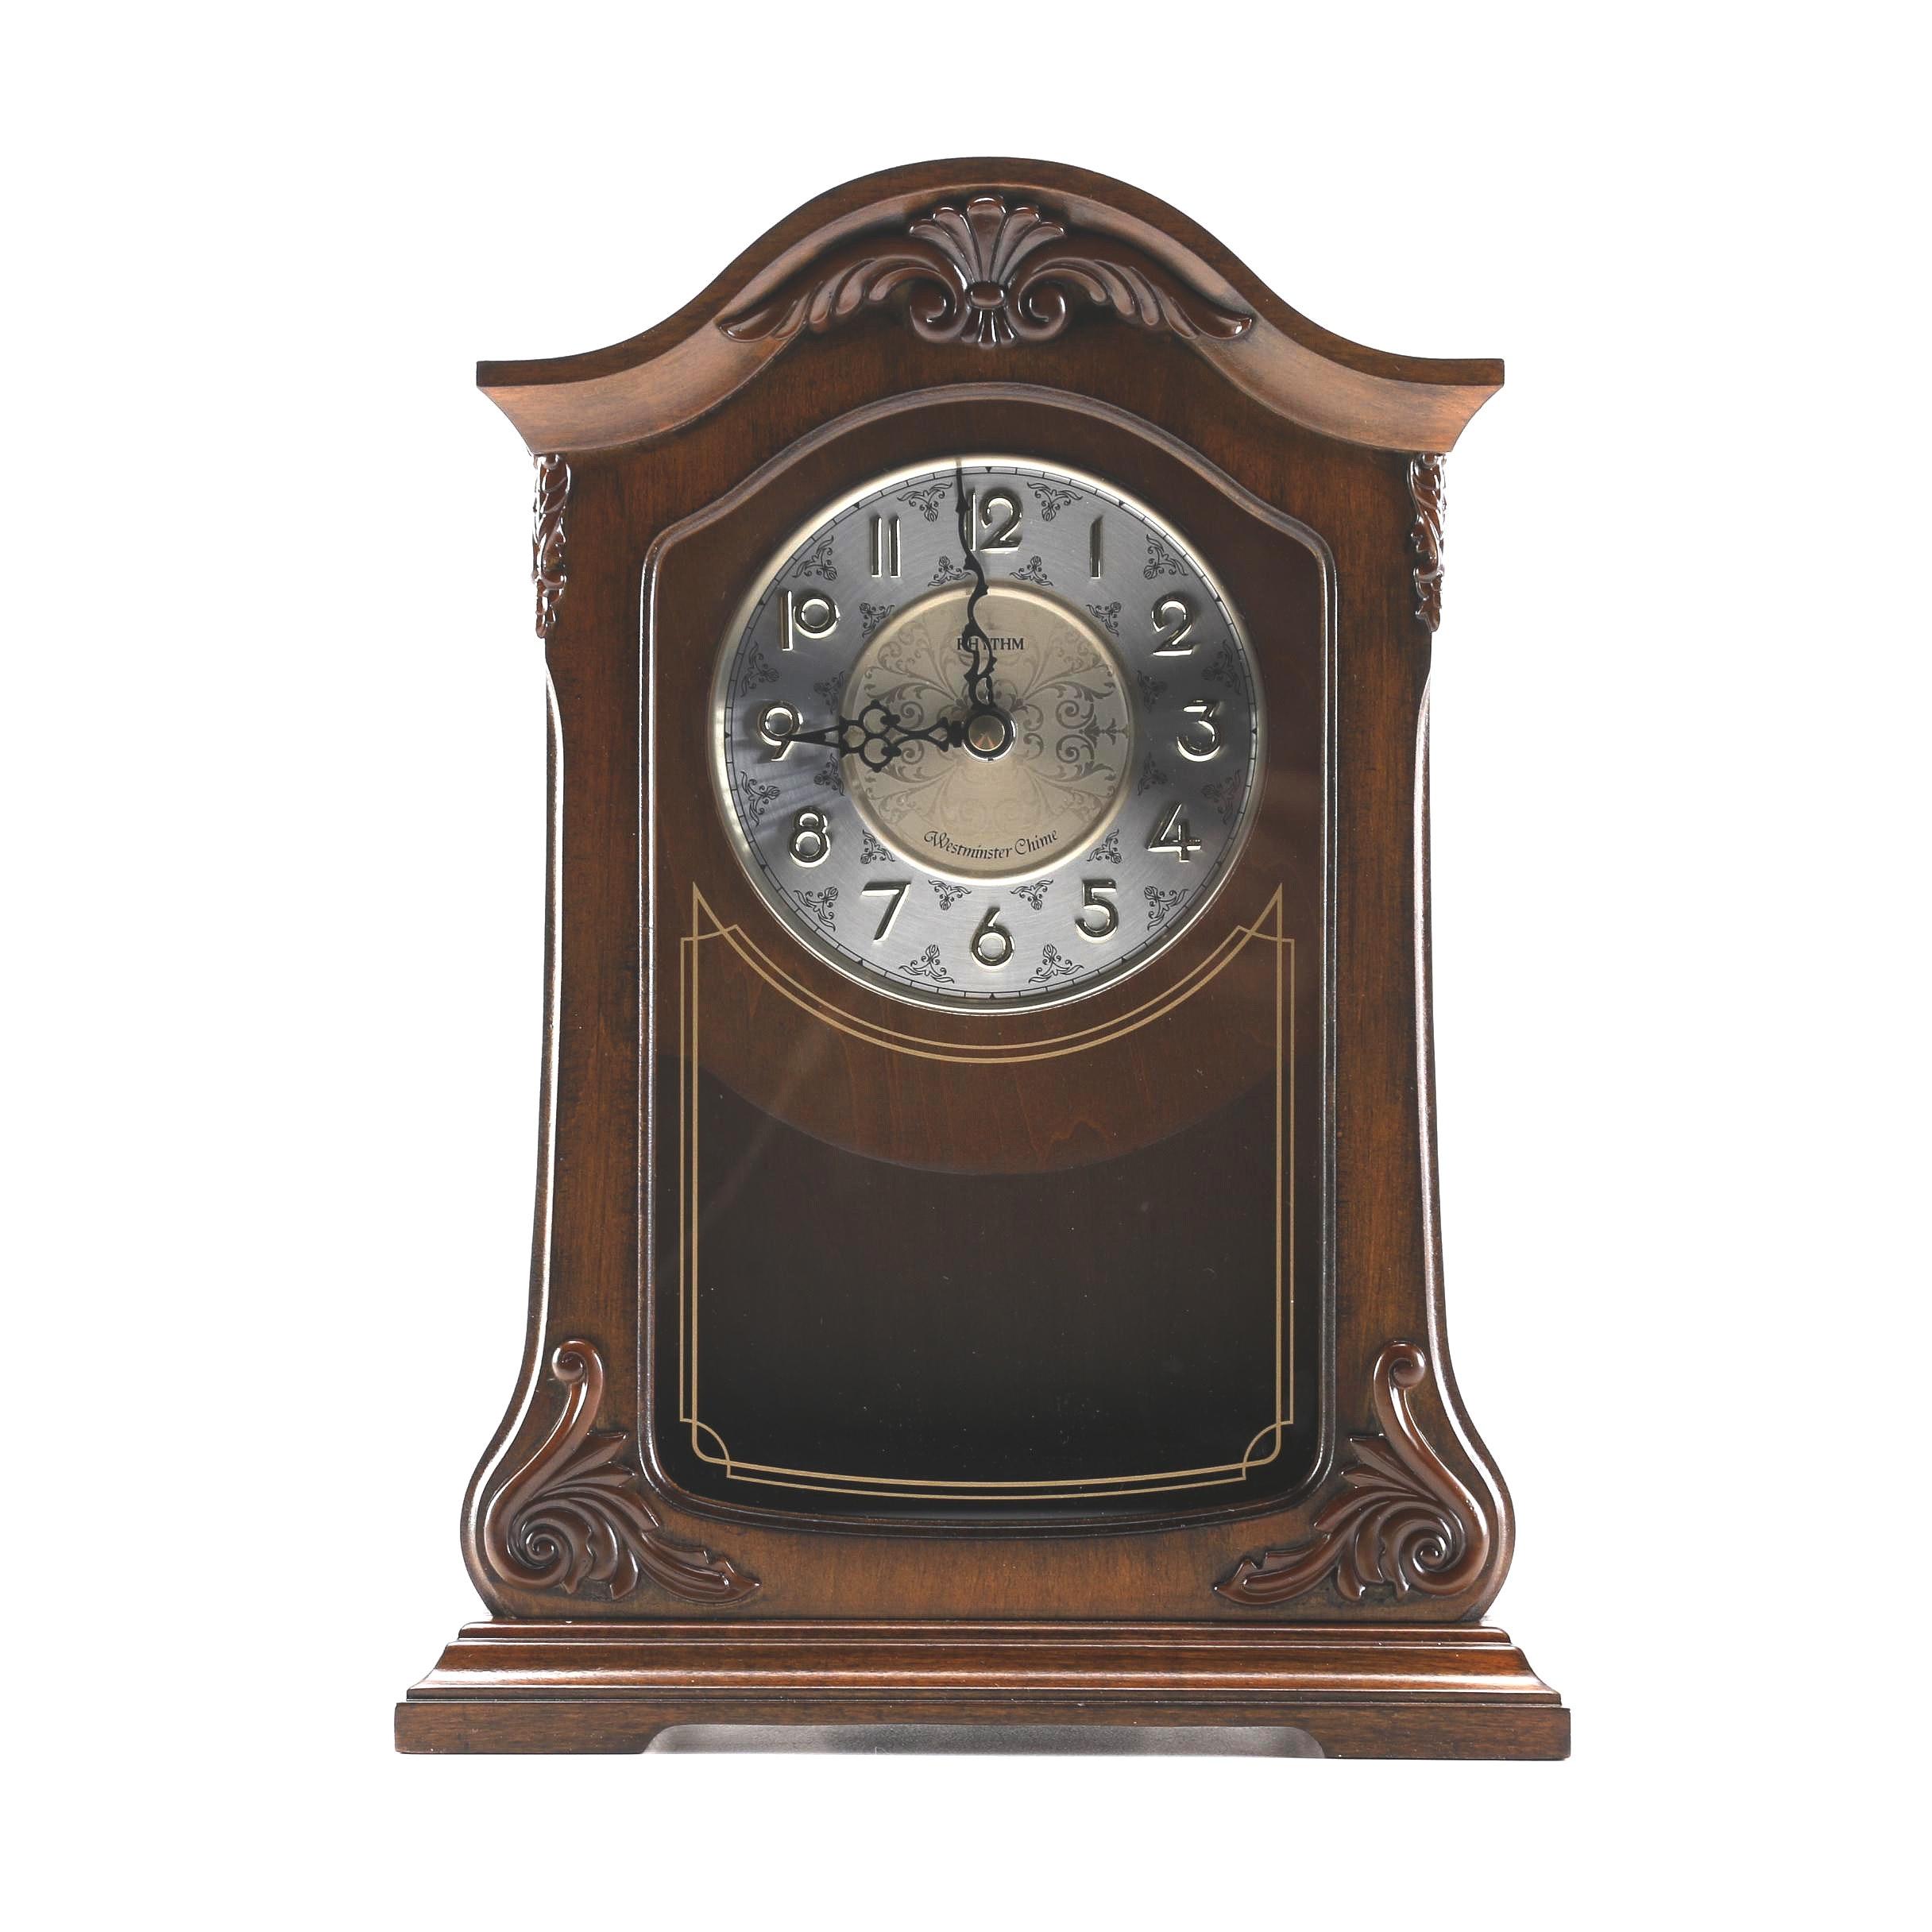 Rhythm Westminster Chime Musical Mantel Clock